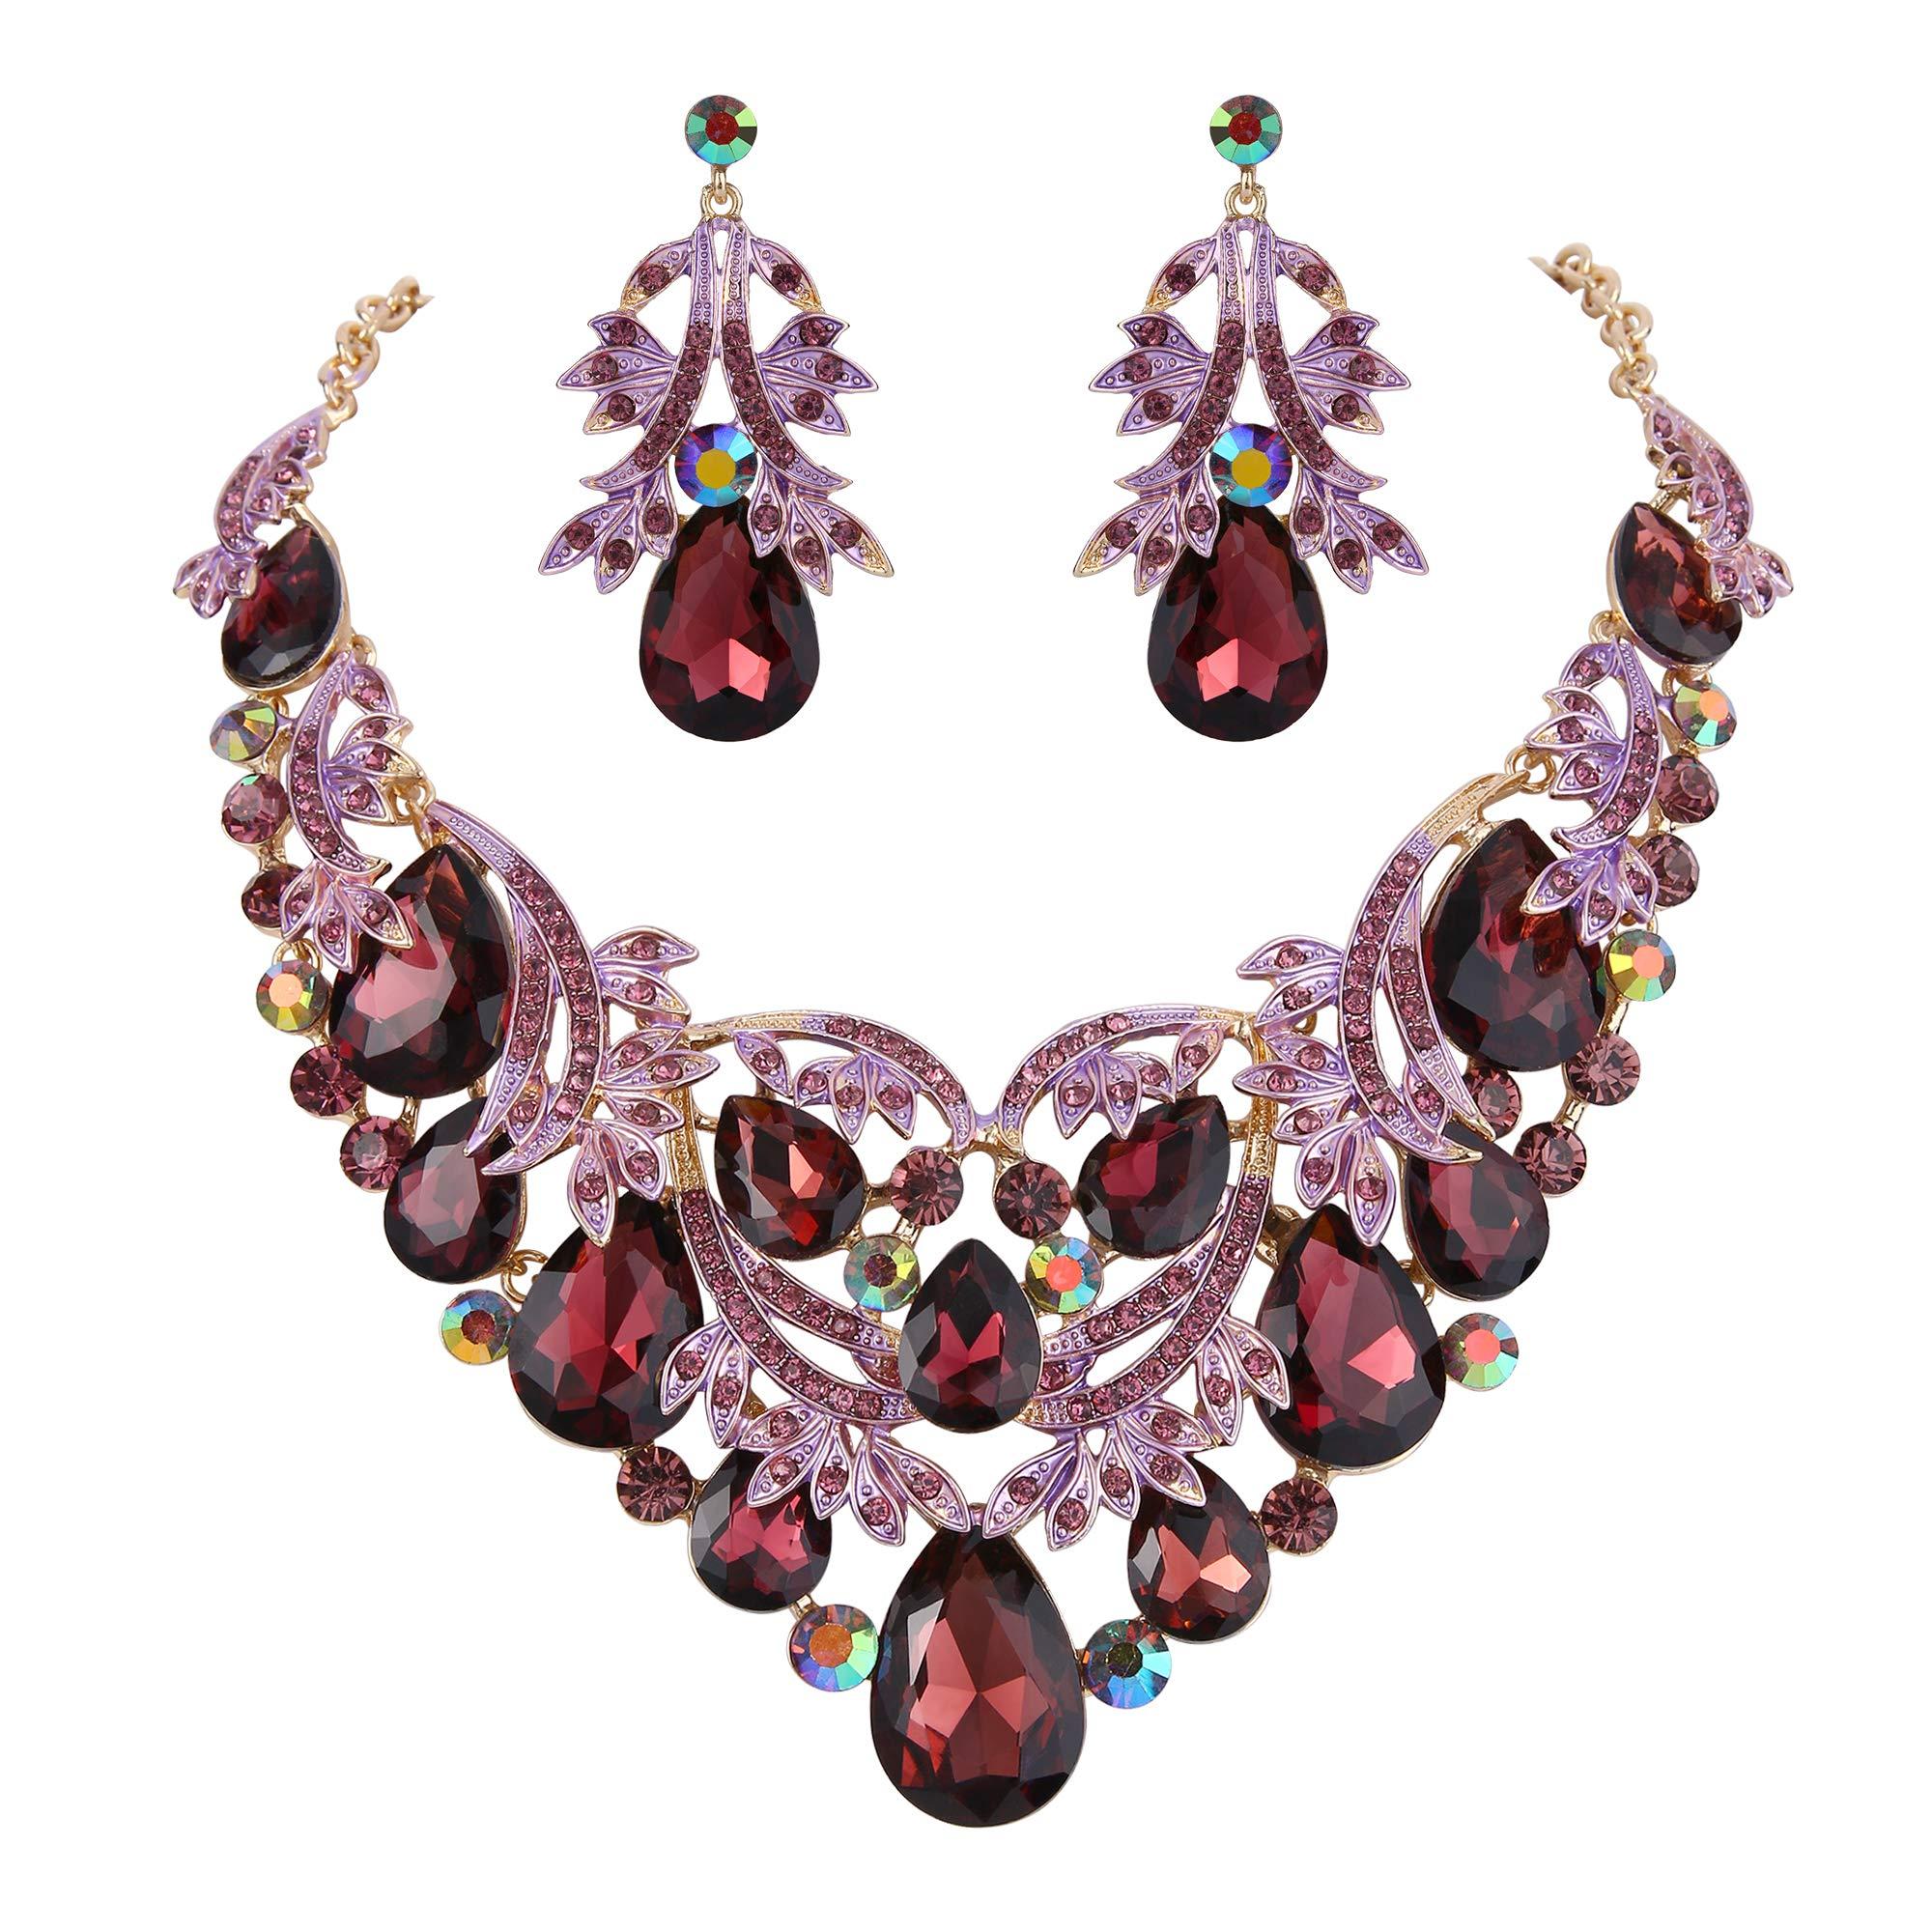 BriLove Gold-Toned Statement Necklace Dangle Earrings Jewelry Set for Women Bohemian Boho Crystal Teardrop Filigree Leaf Hollow Jewelry Set Deep Amethyst Color